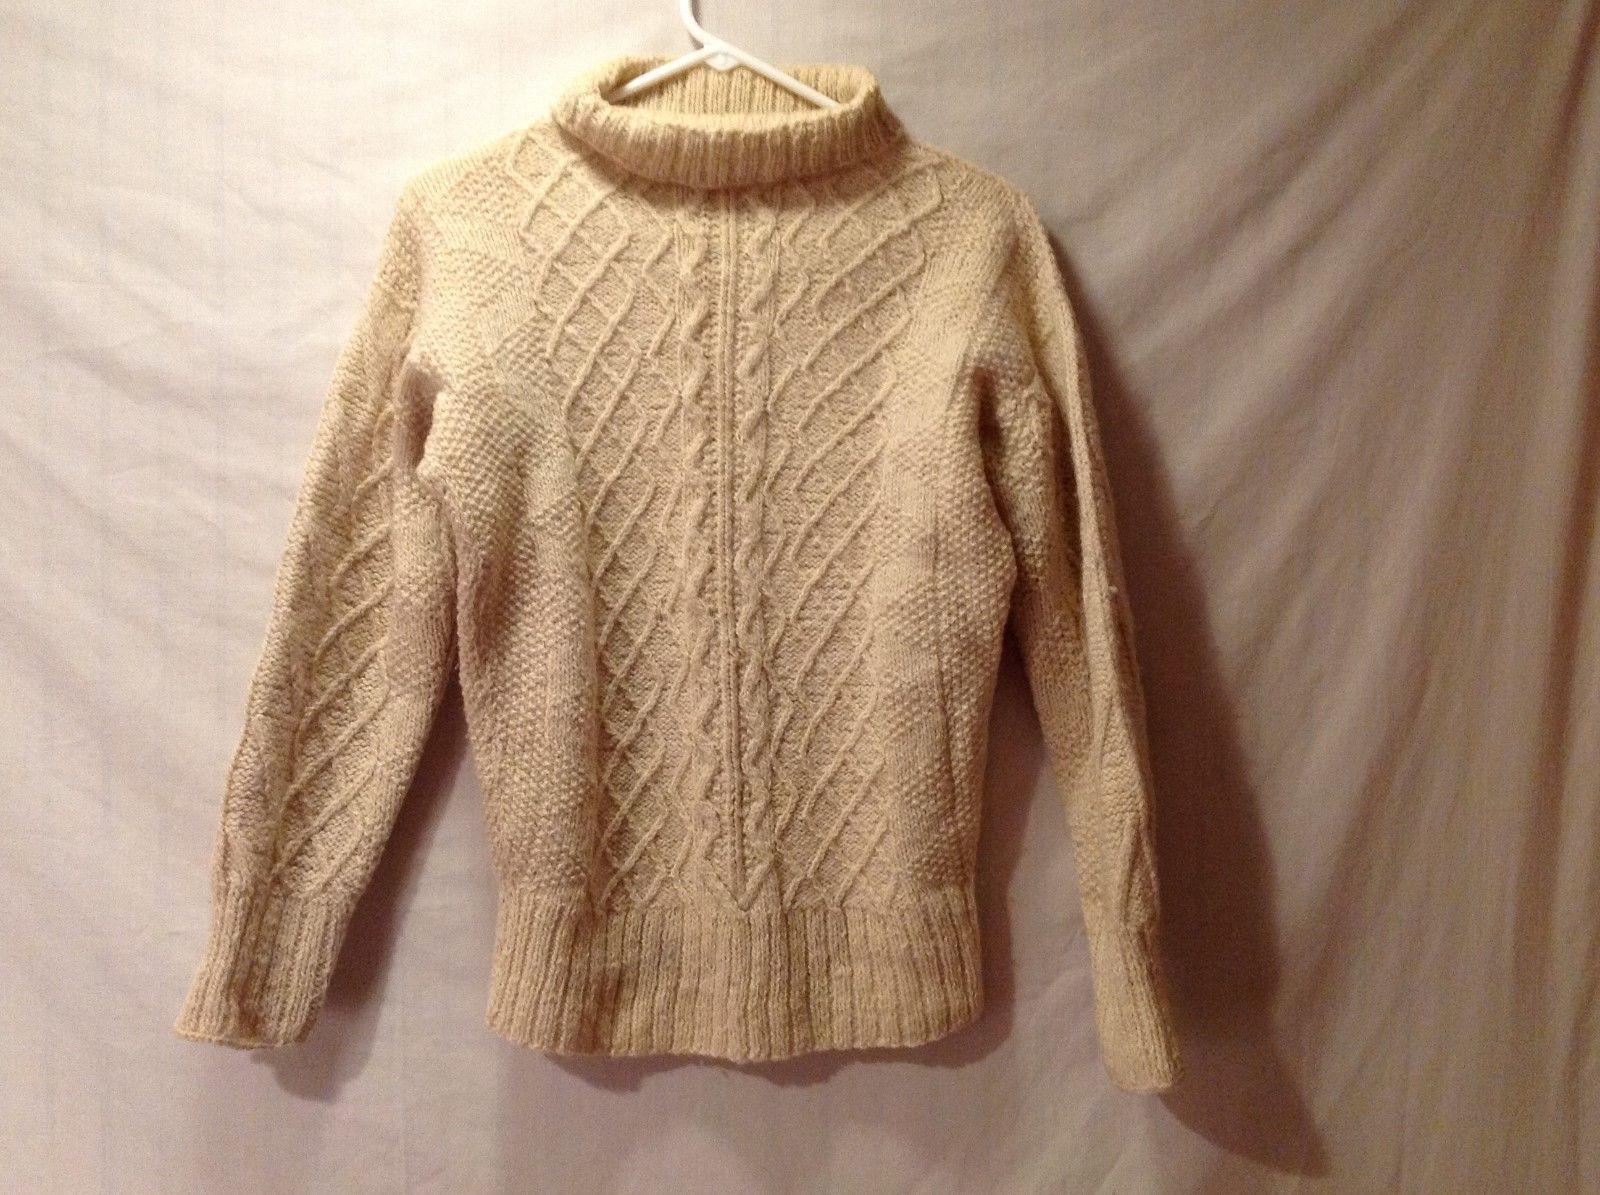 Unisex Turtleneck Sweater Handmade Irish Knit